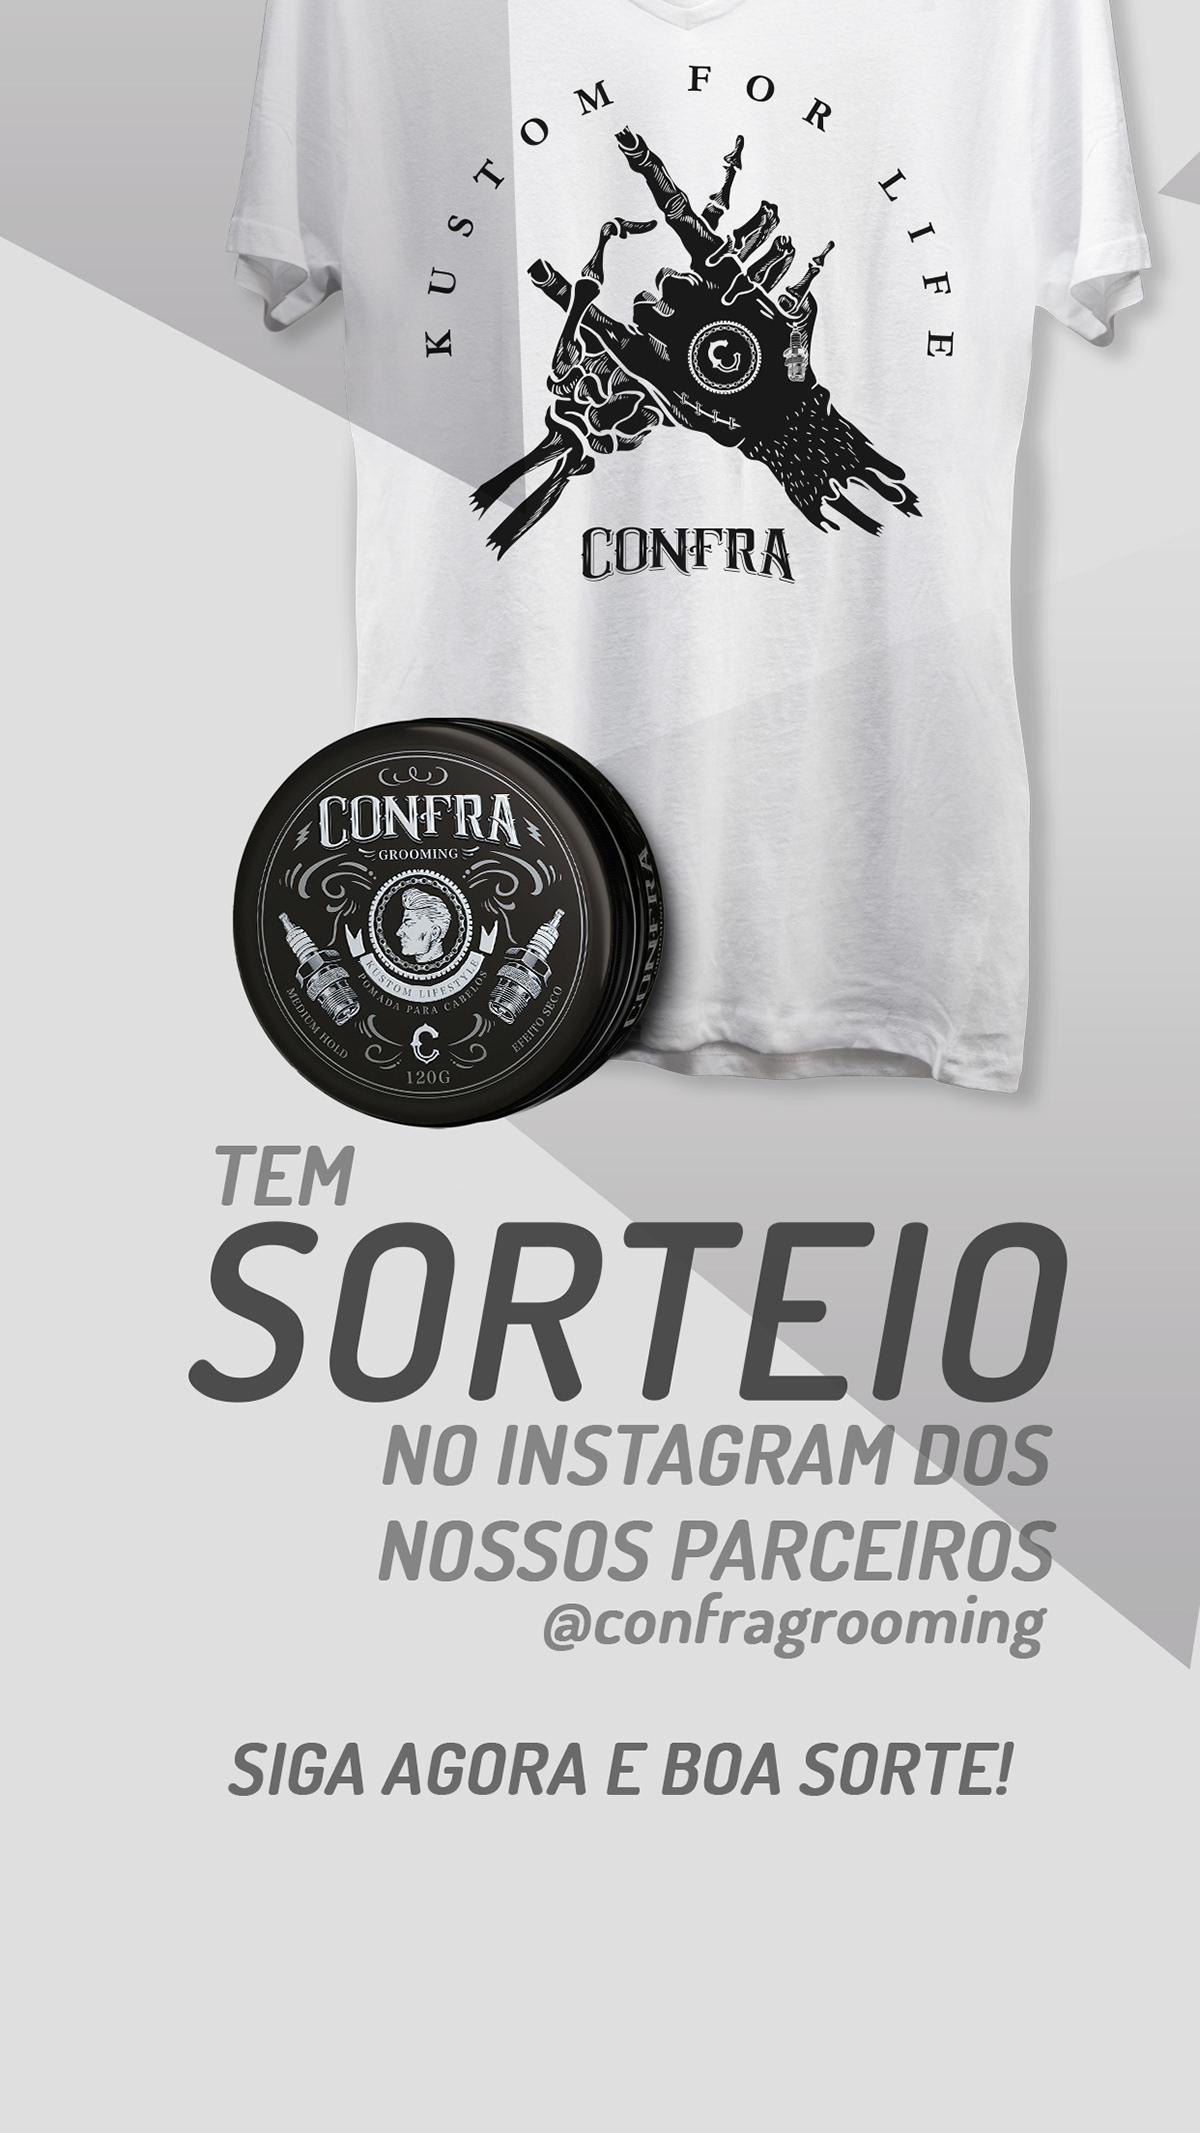 banner campanha isntagram post sorteio